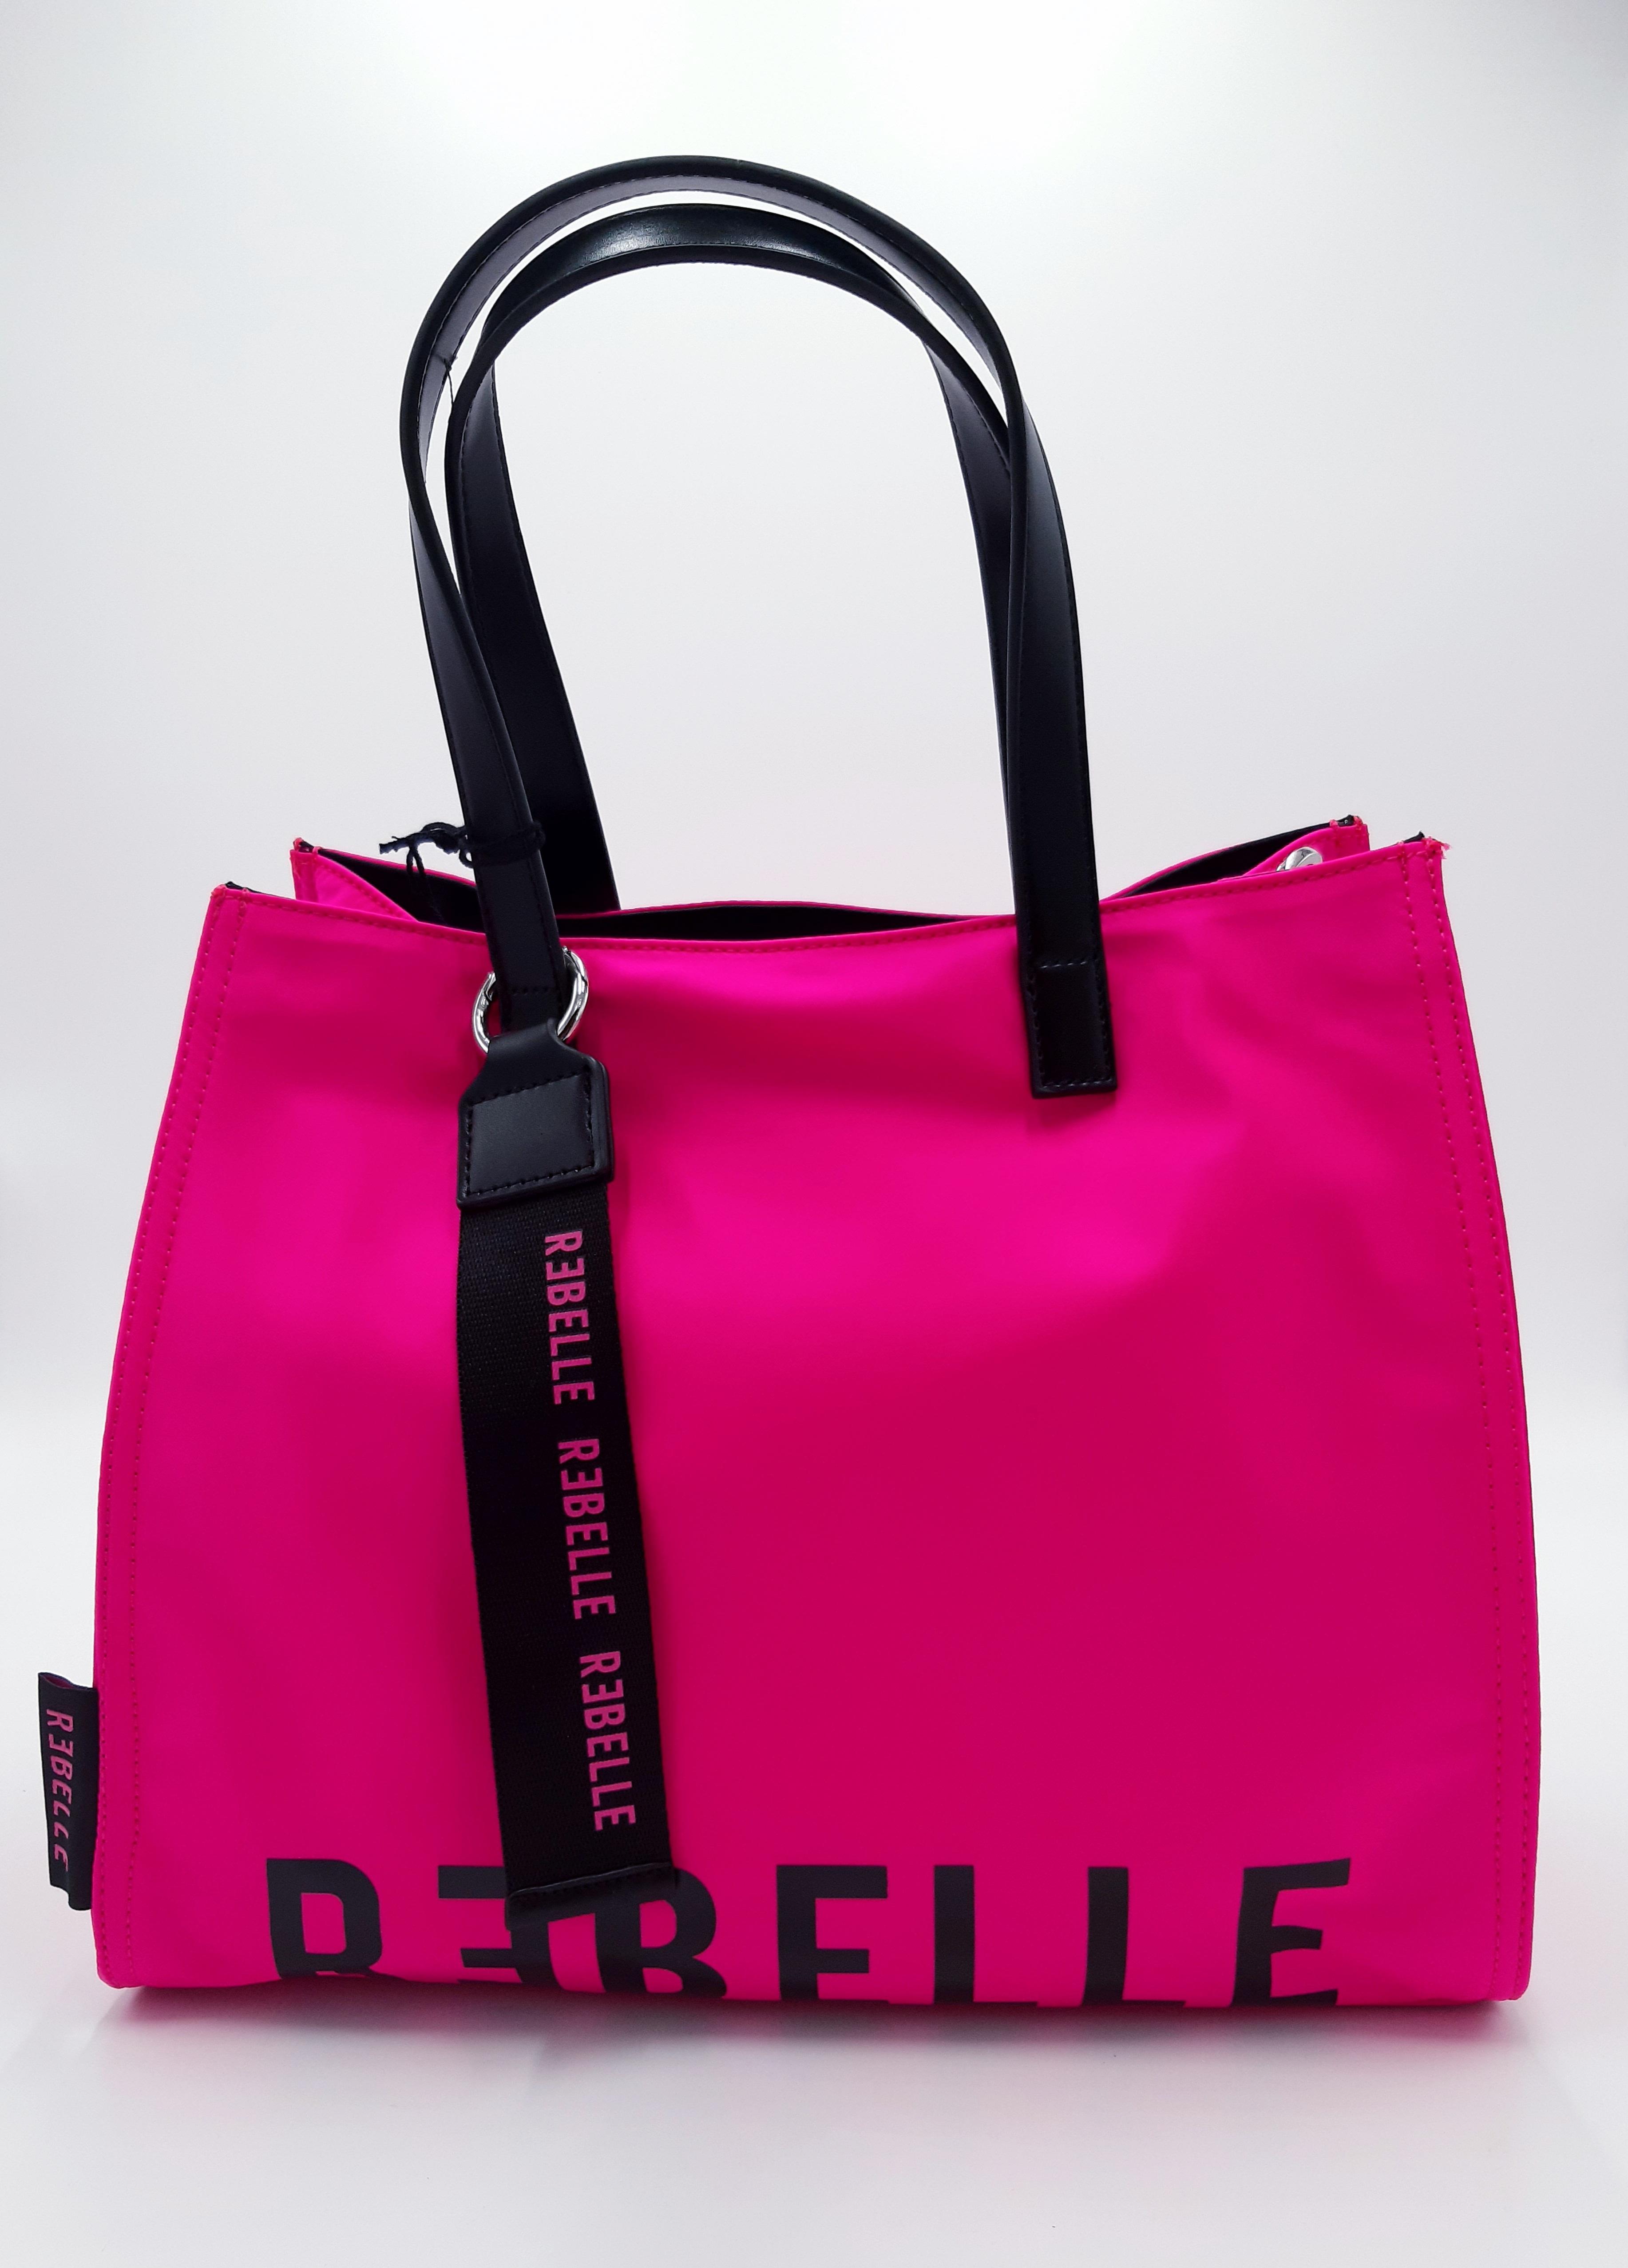 Shopping in tessuto tecnico fuxia Rebelle